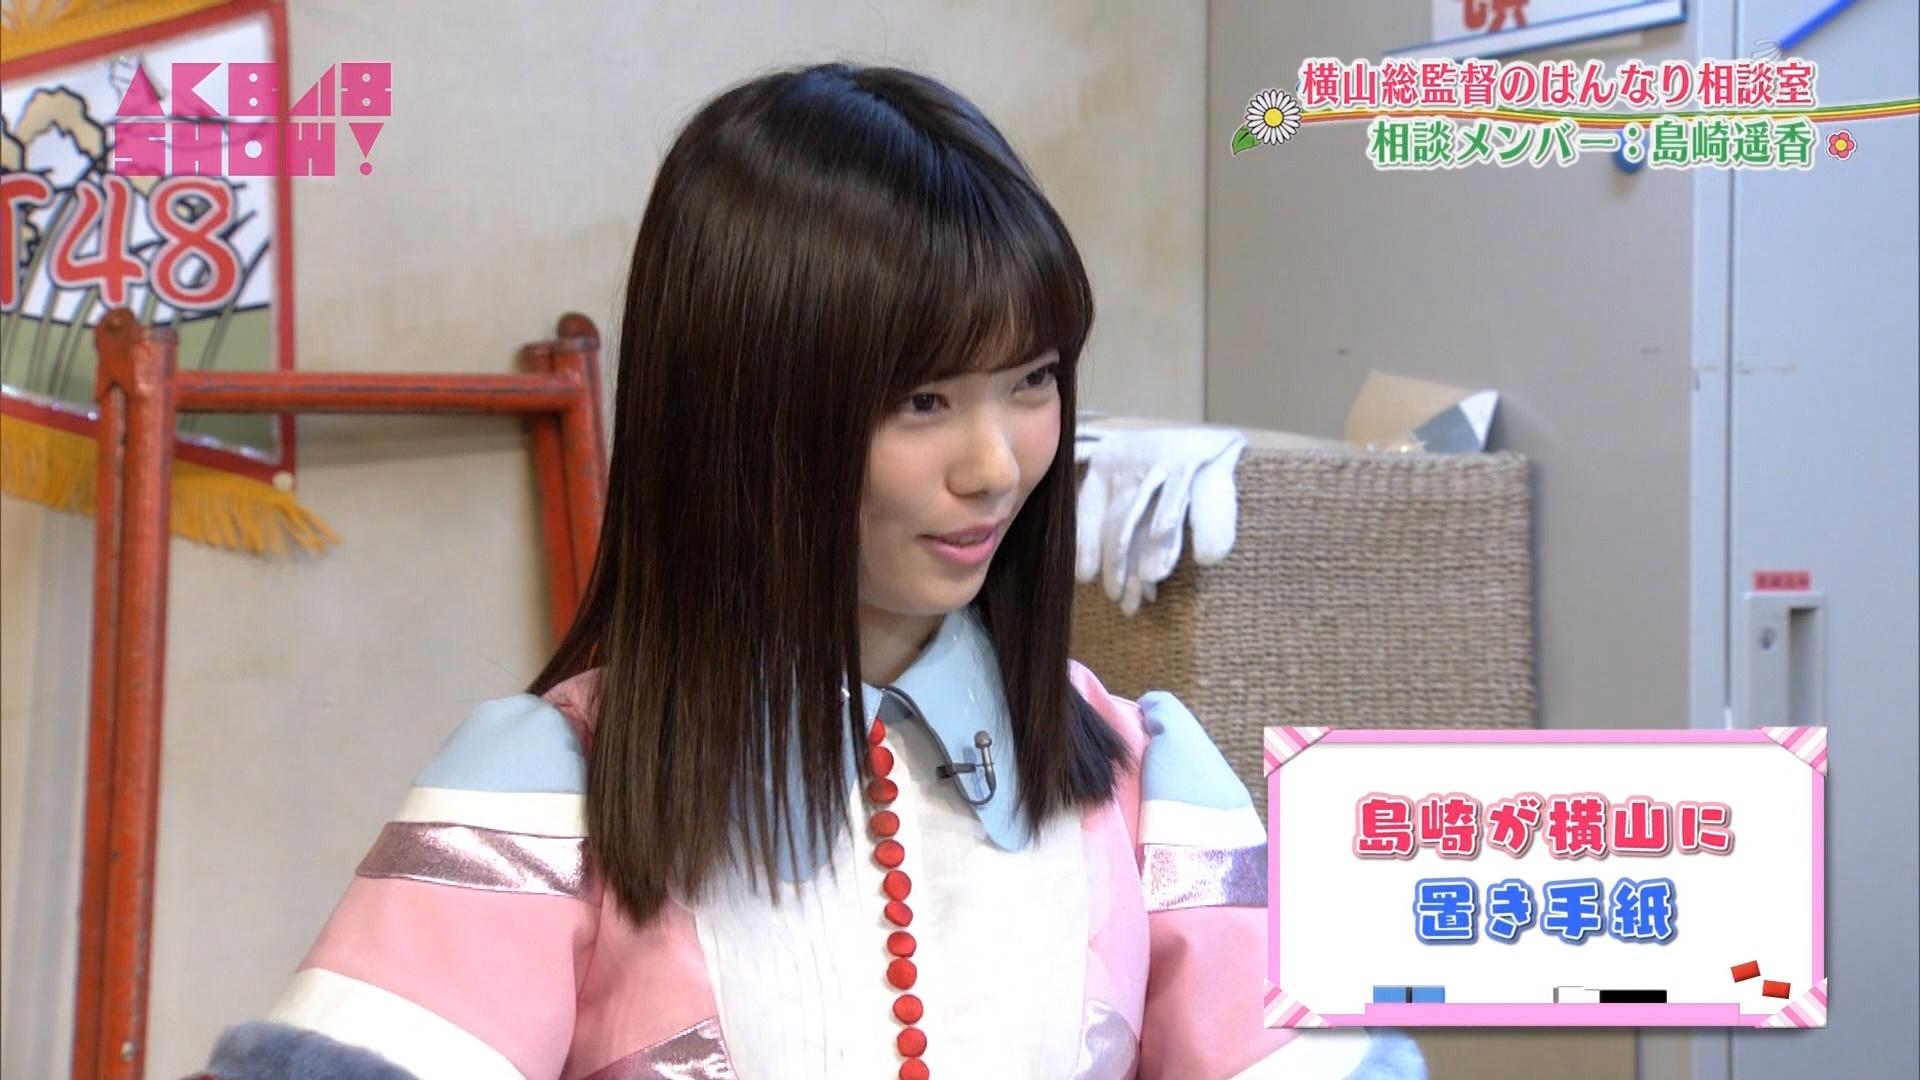 AKB48SHOW「#133」★1 [無断転載禁止]©2ch.net->画像>249枚